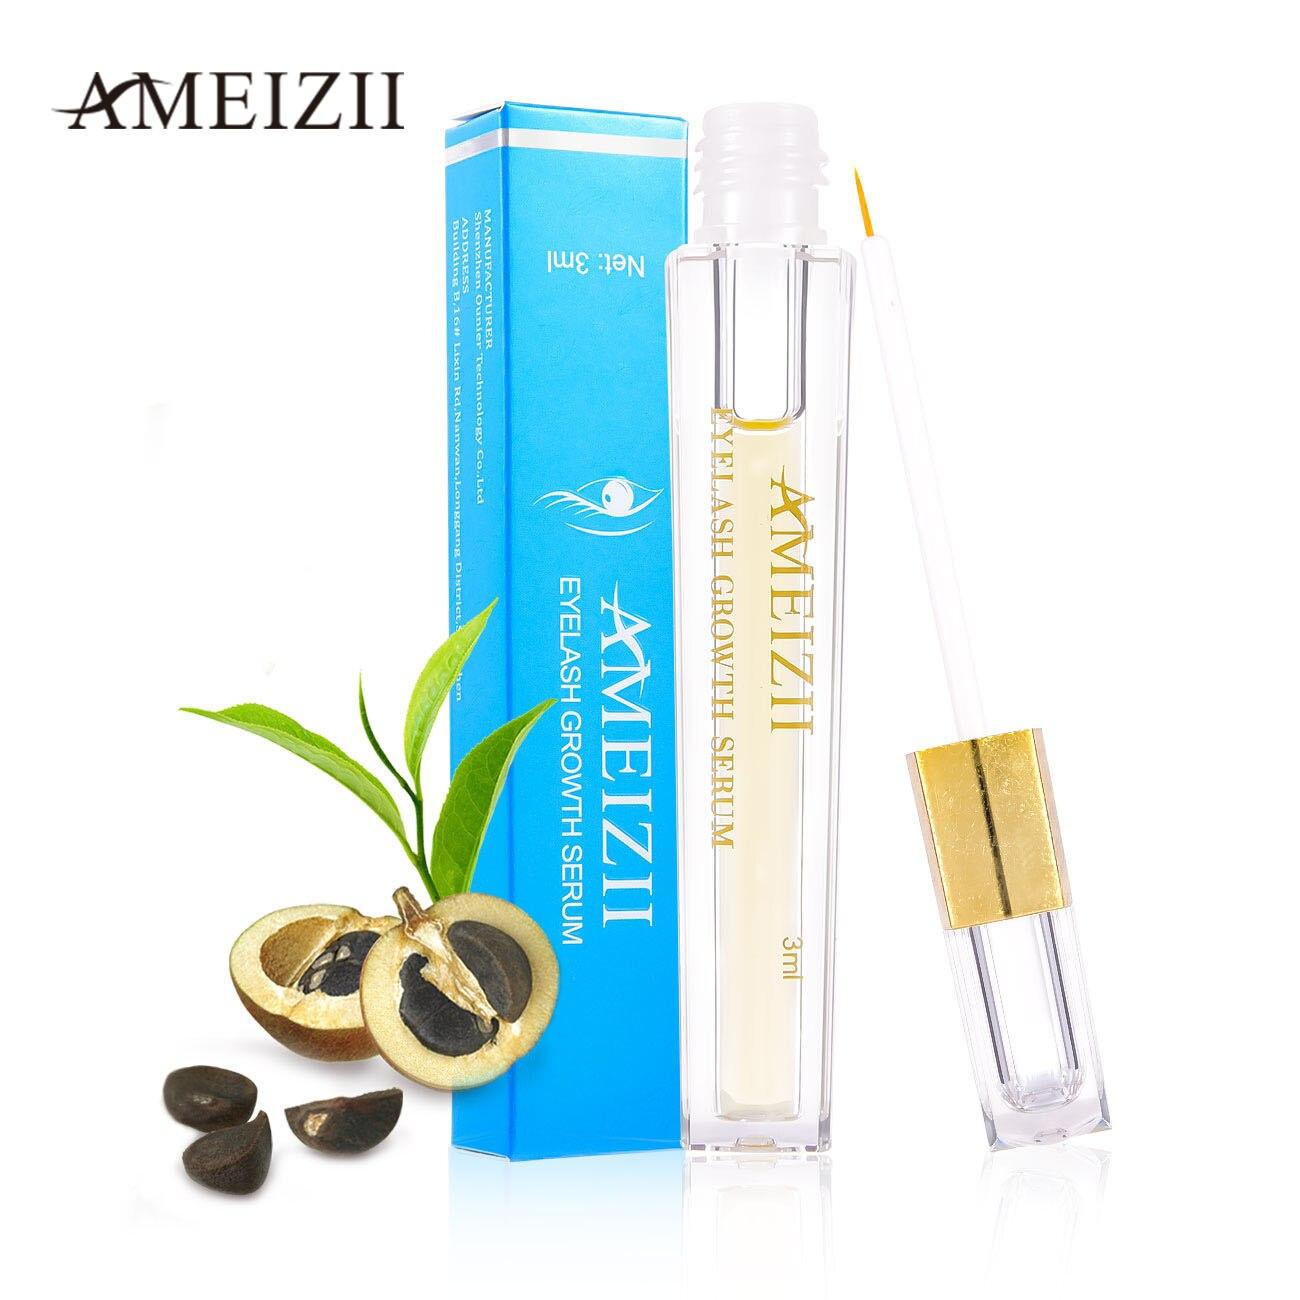 Ameizii cílios crescimento soro natural curling lash lift wimper soro pestana realçador tratamento olhos cílios levantamento de óleo essencial